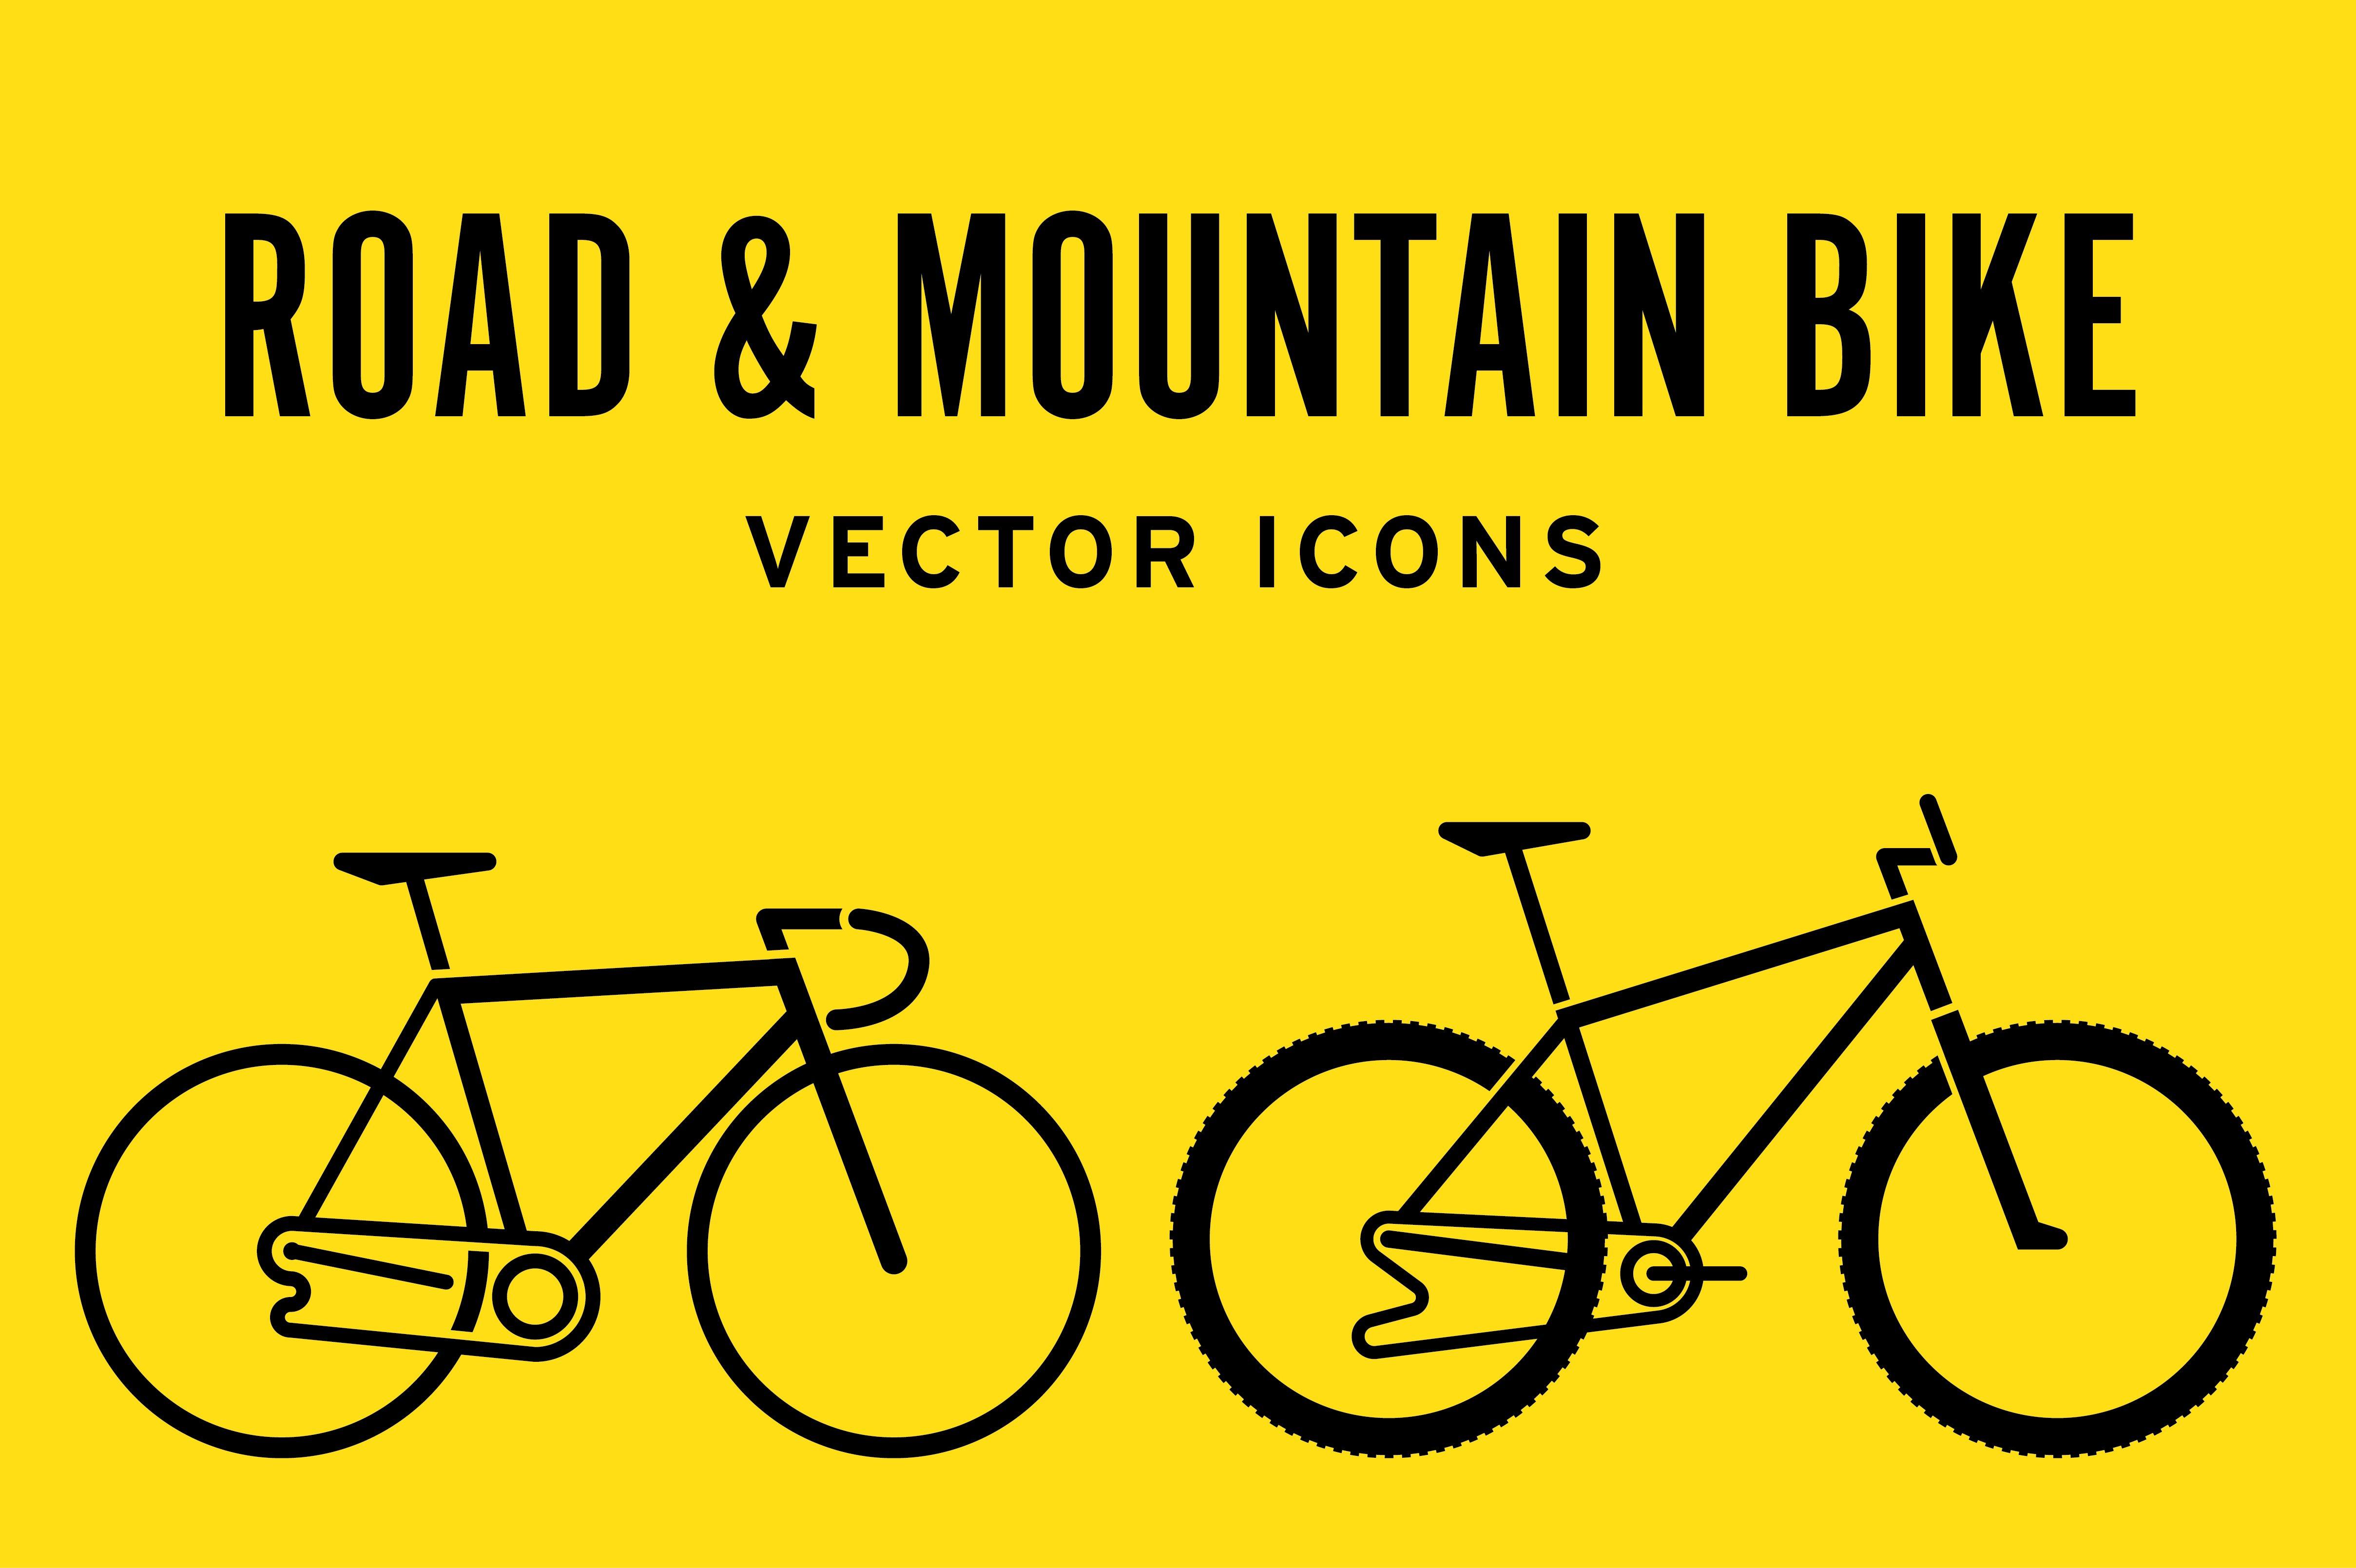 Road mountain bike icons icons creative market biocorpaavc Images